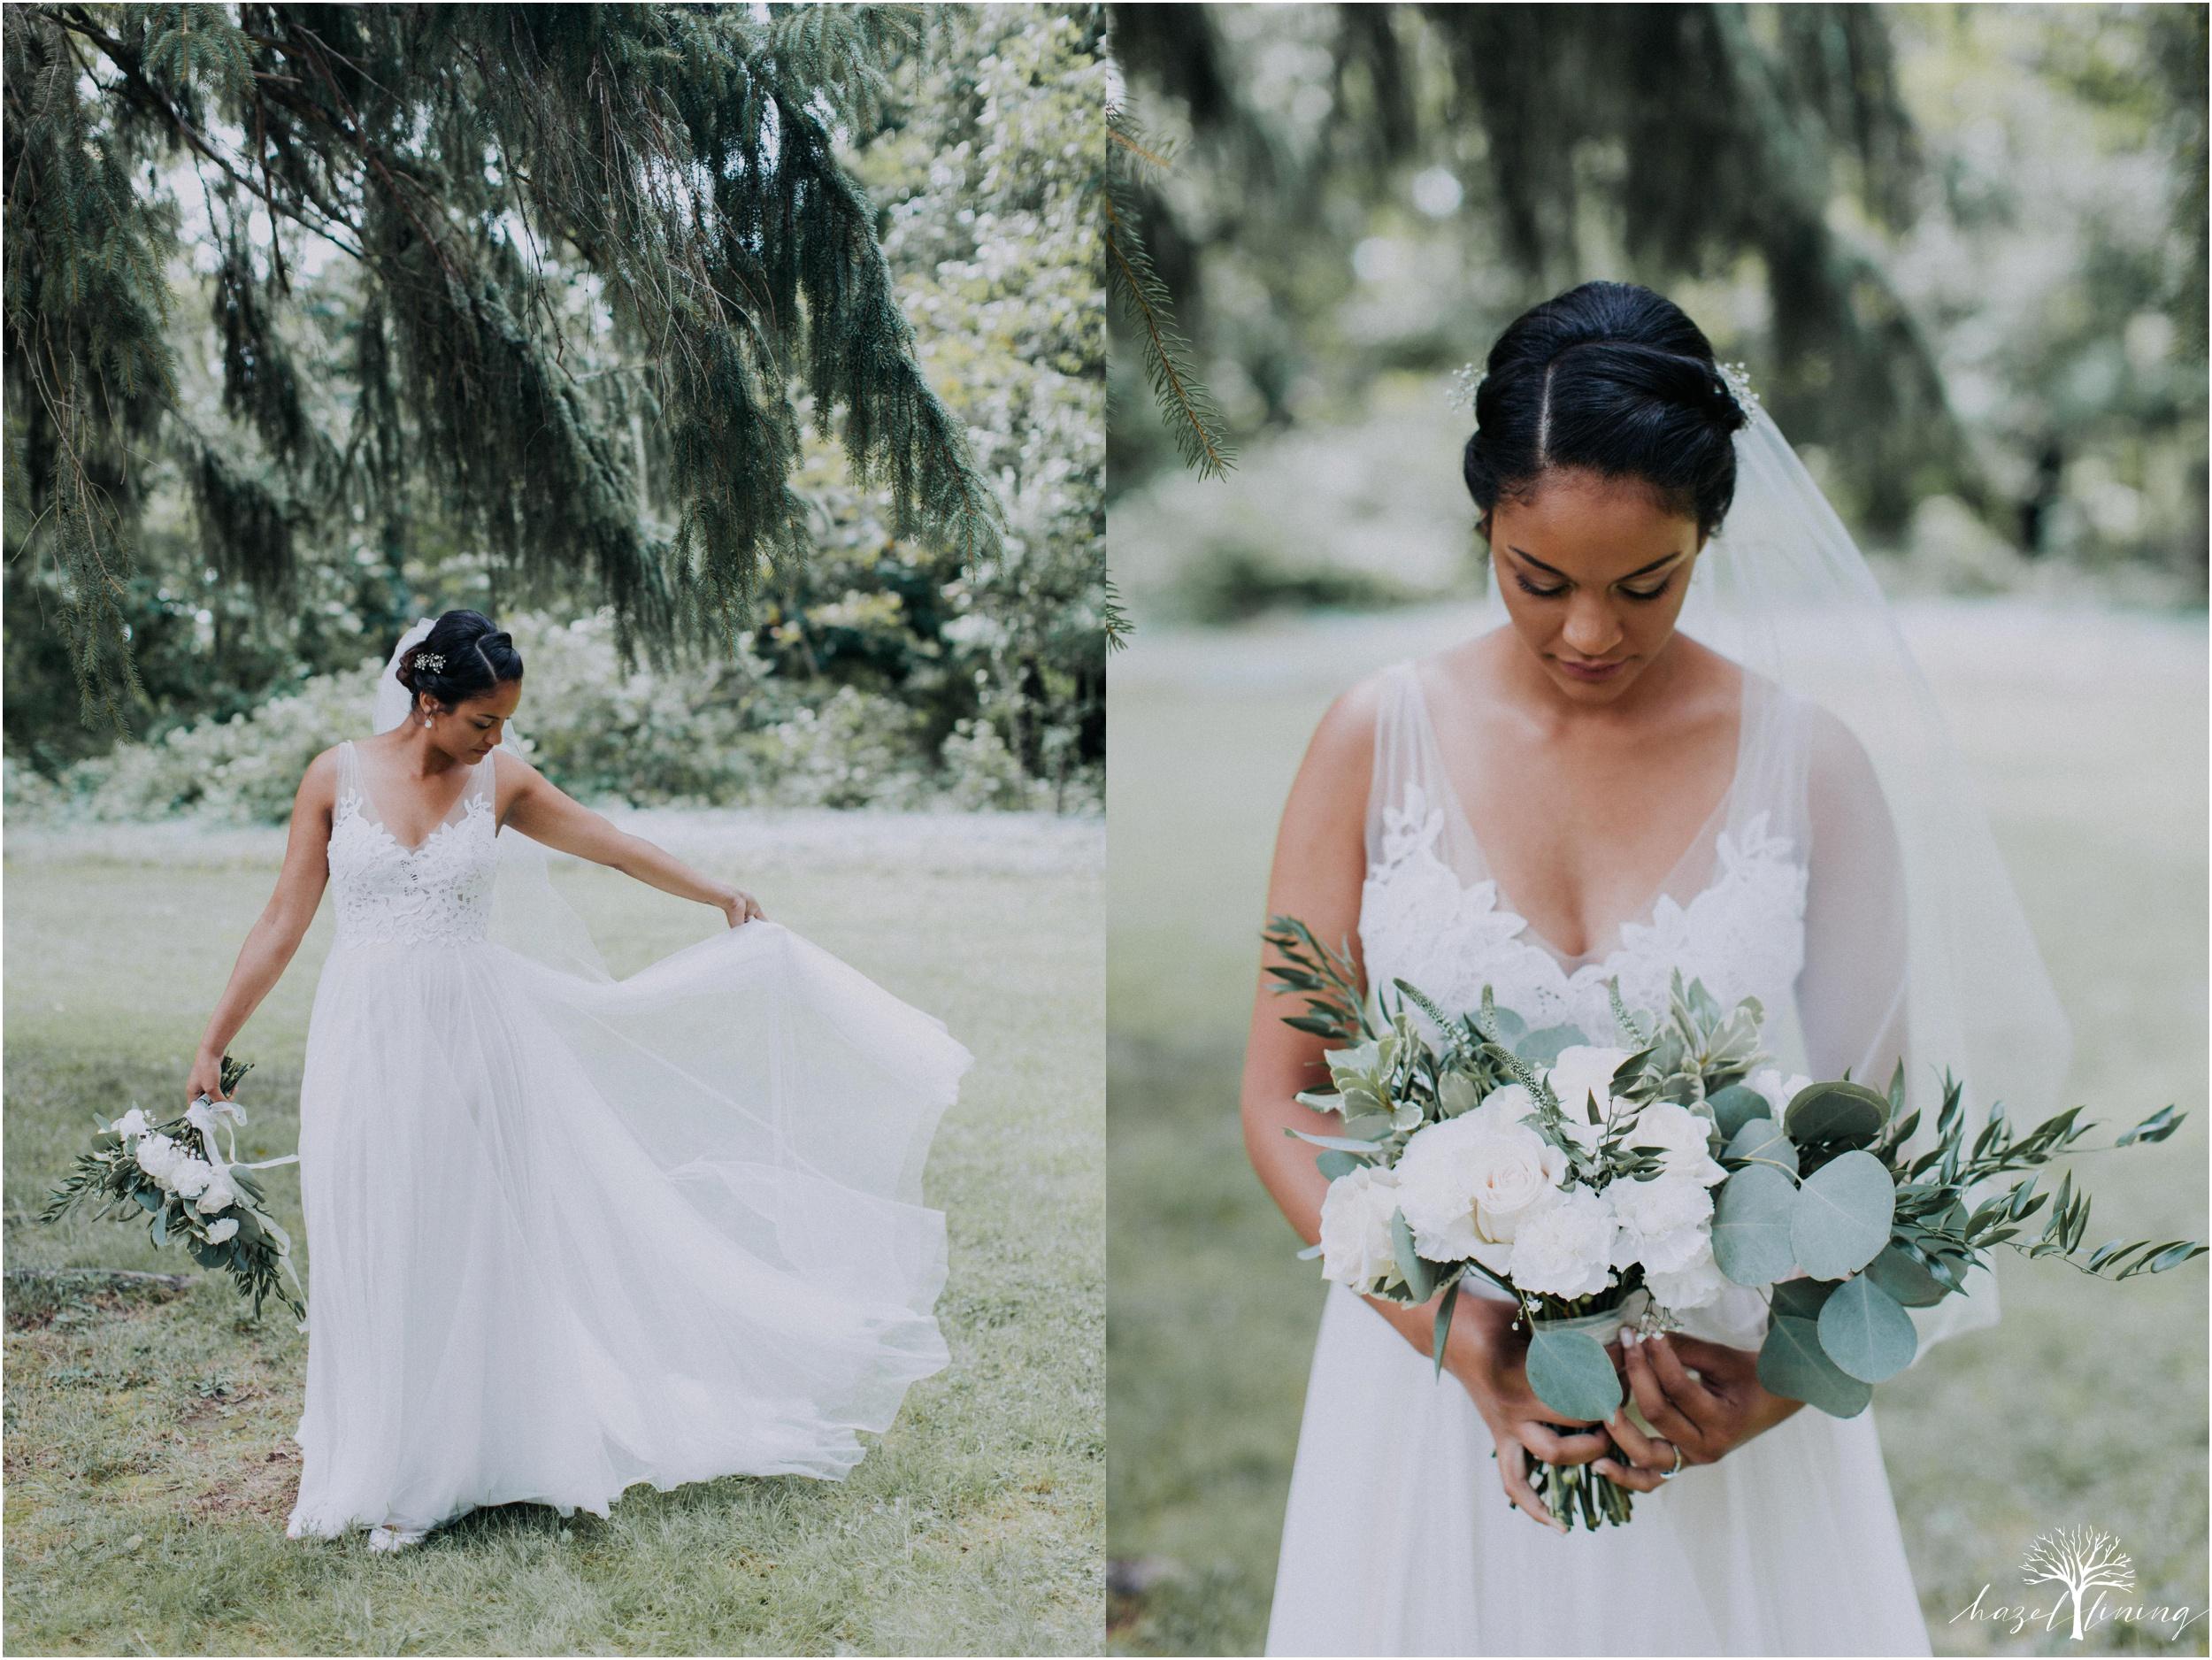 mariah-kreyling-samuel-sherratt-sherrattwiththeworld-peirce-farm-at-witch-hill-boston-massachusetts-wedding-photography-hazel-lining-travel-wedding-elopement-photography_0044.jpg